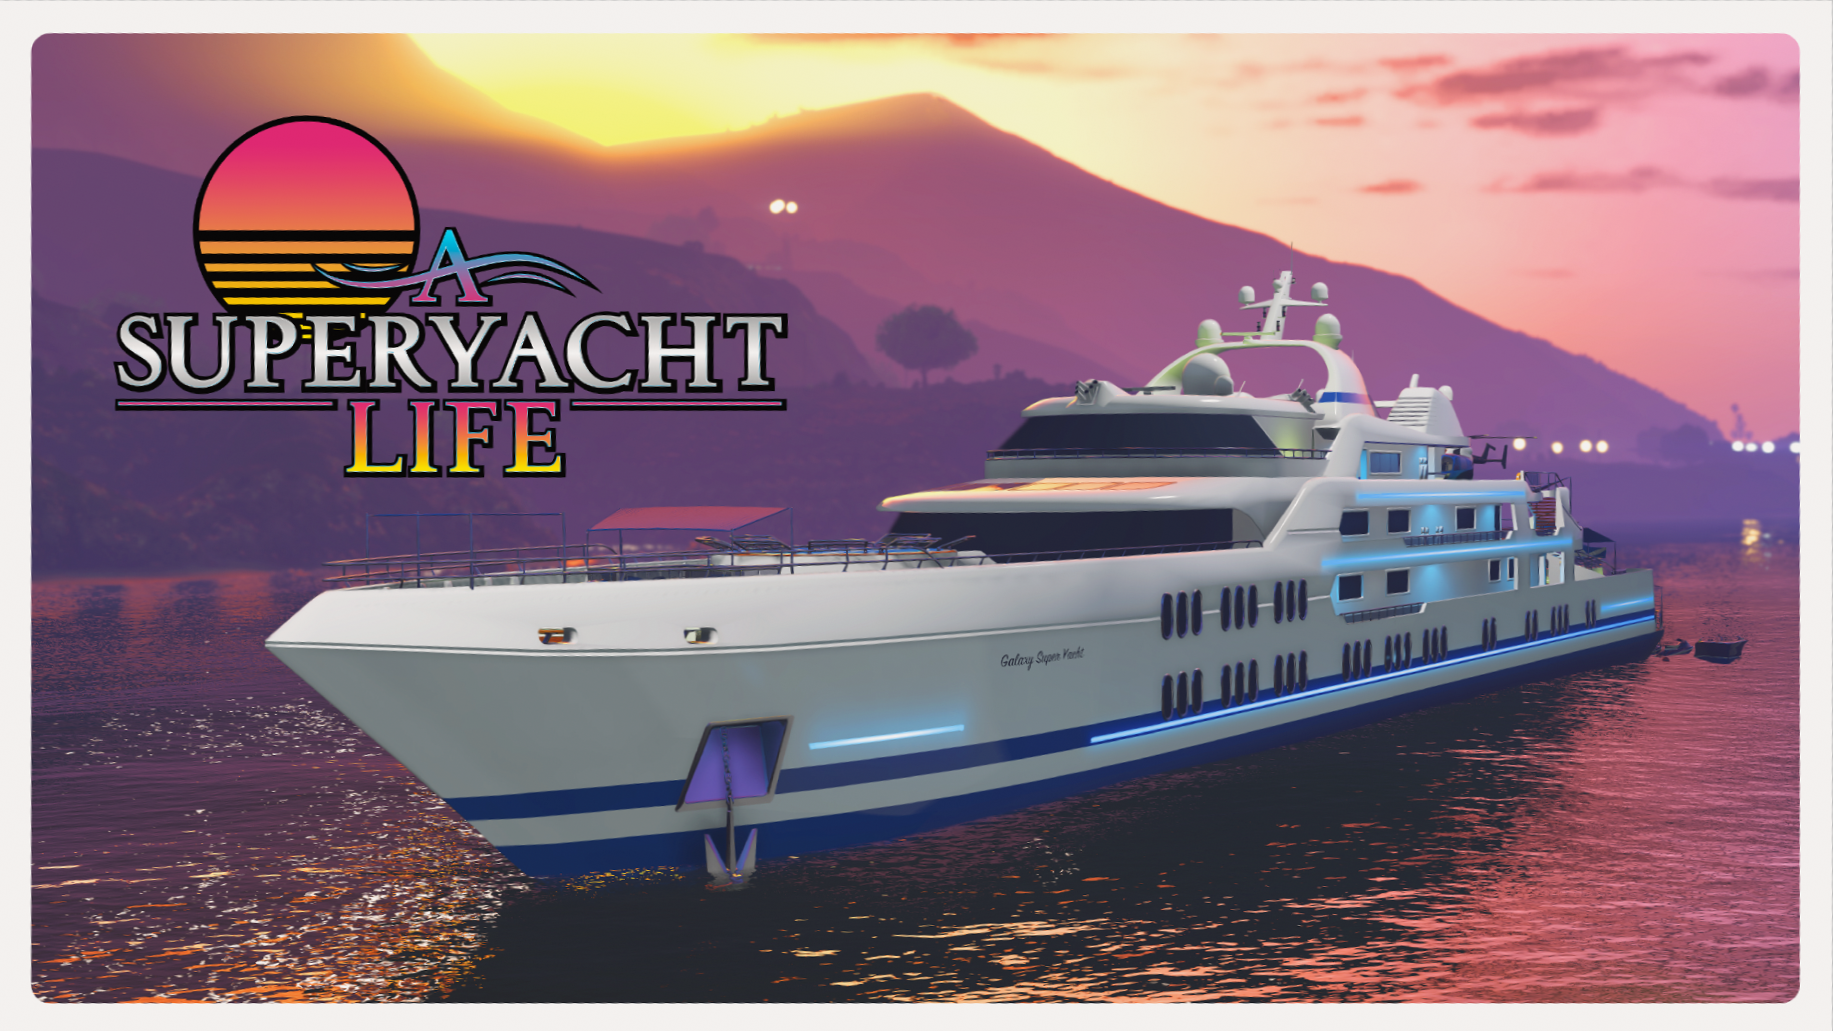 A Superyacht Life